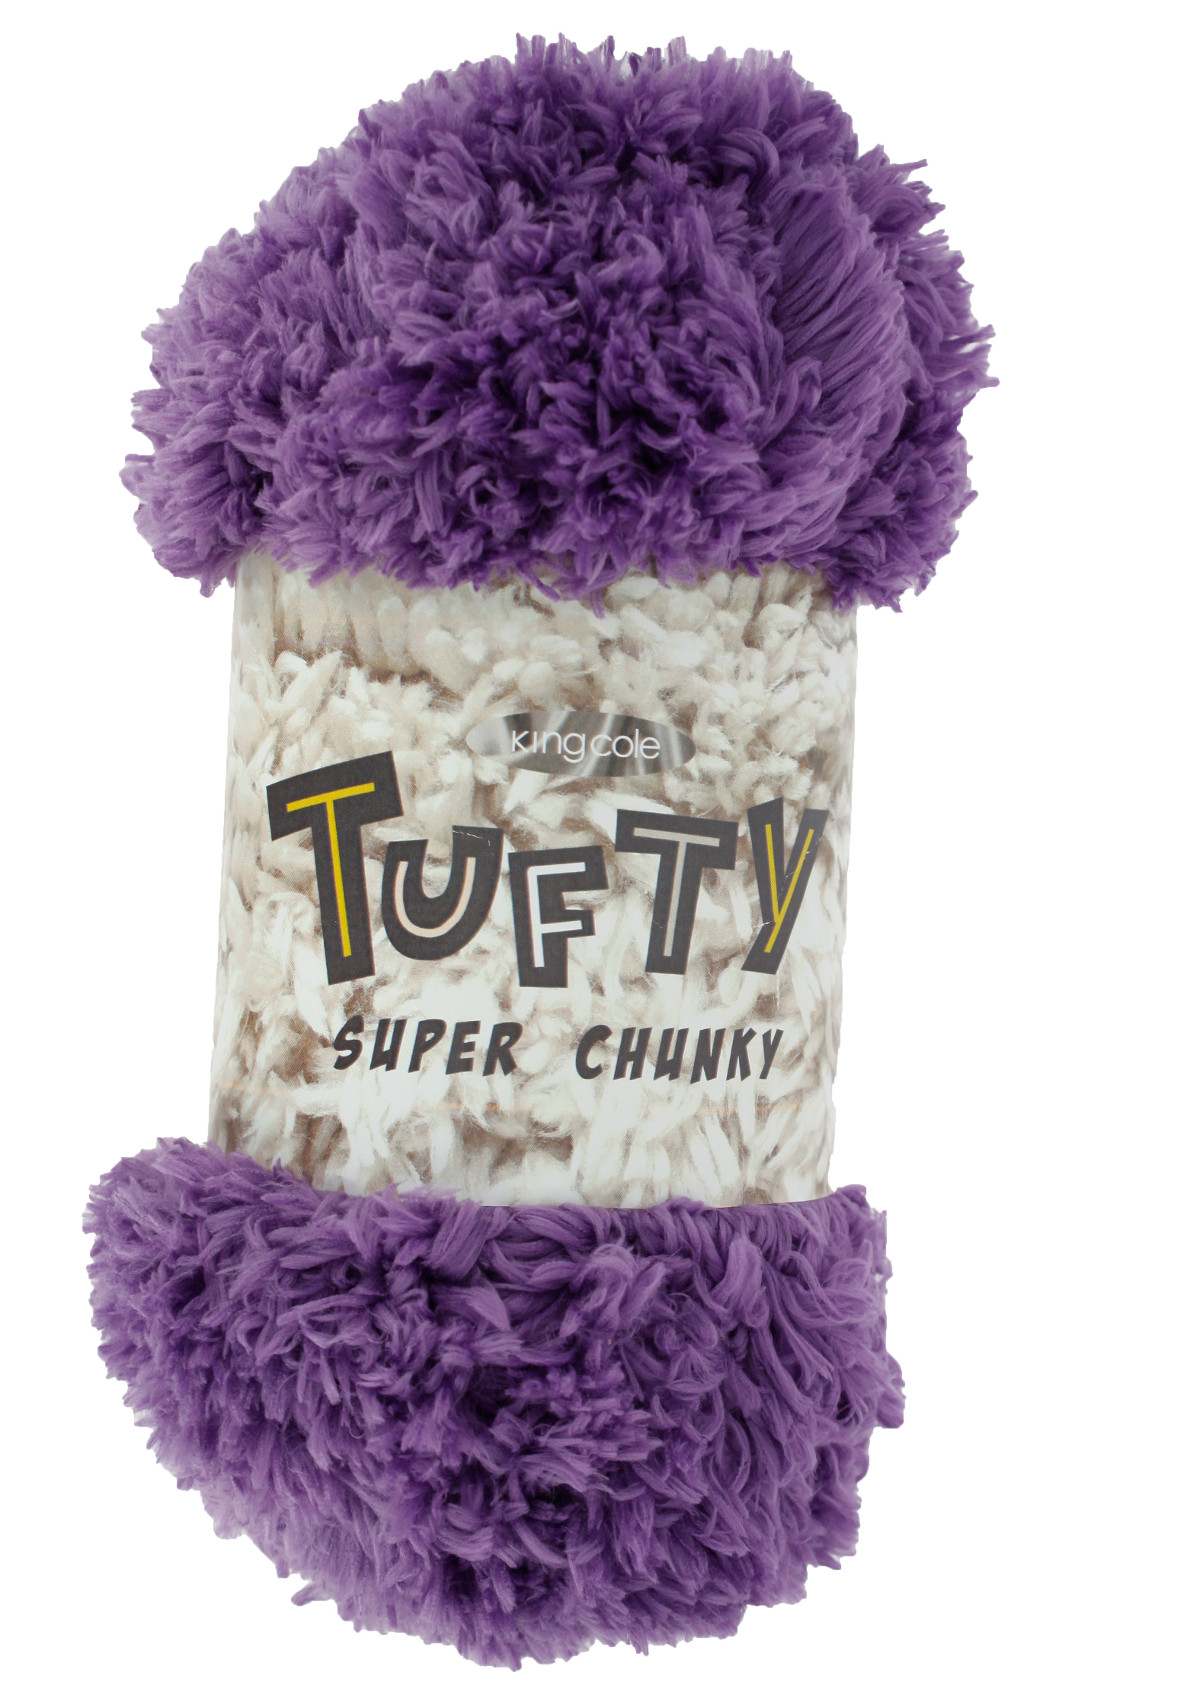 200g Super Chunky Yarn & Free Knitting Pattern King Cole Wool 1 2 or ...